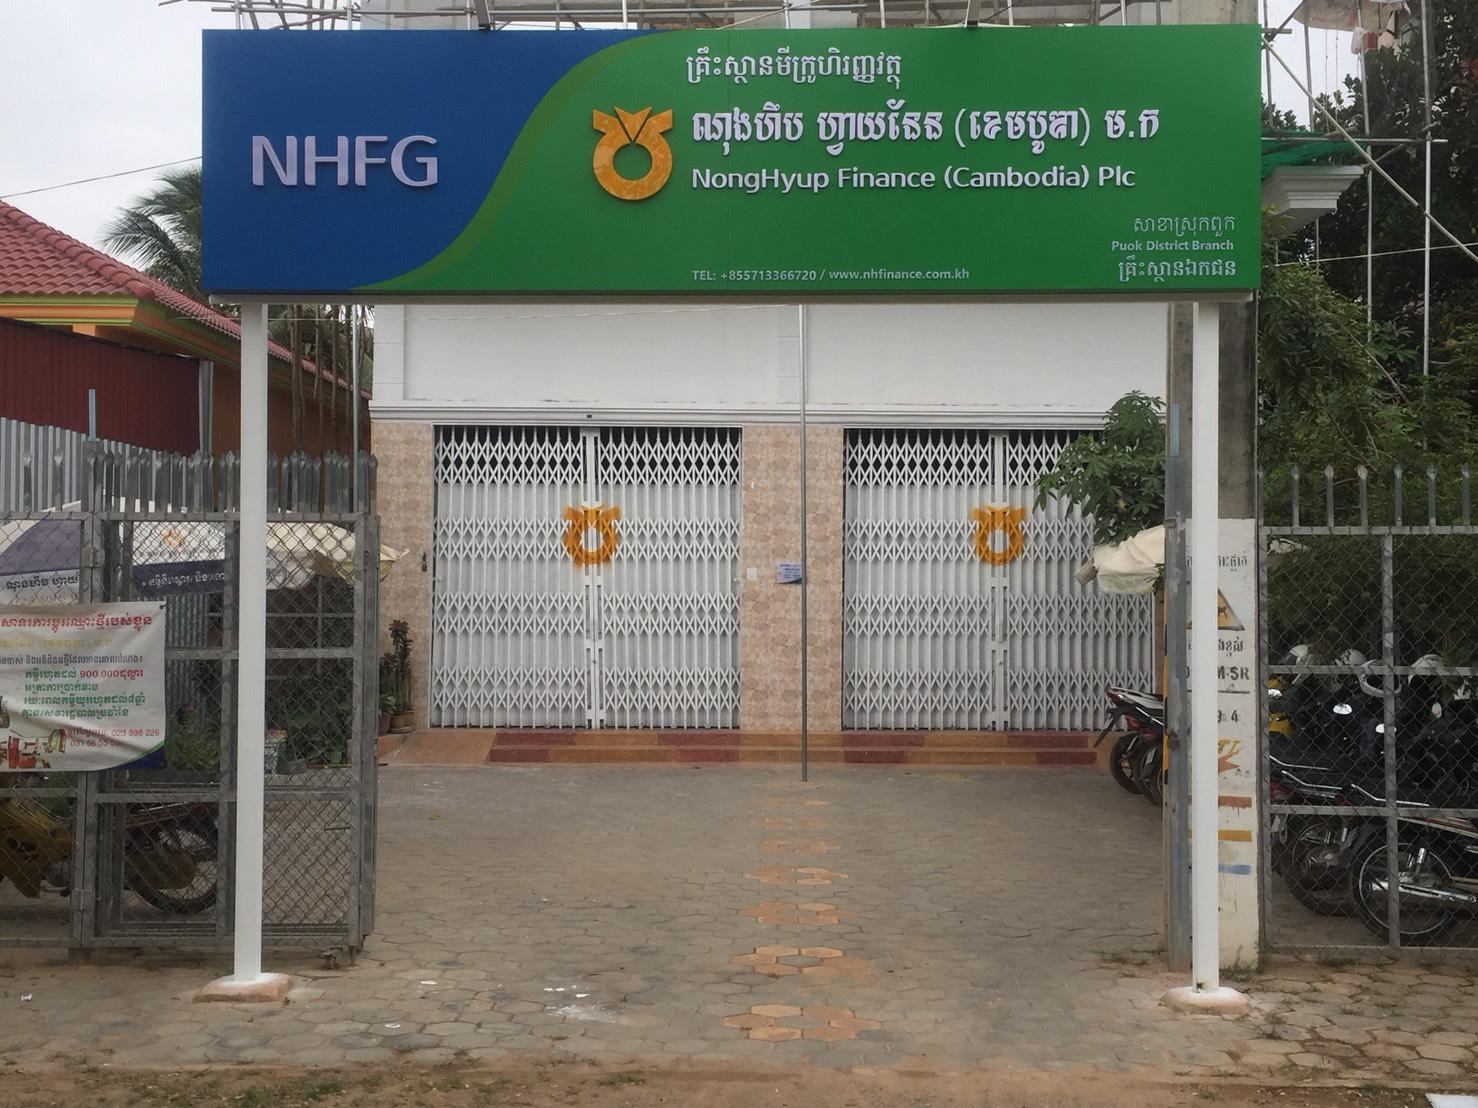 NHF Puok Branch